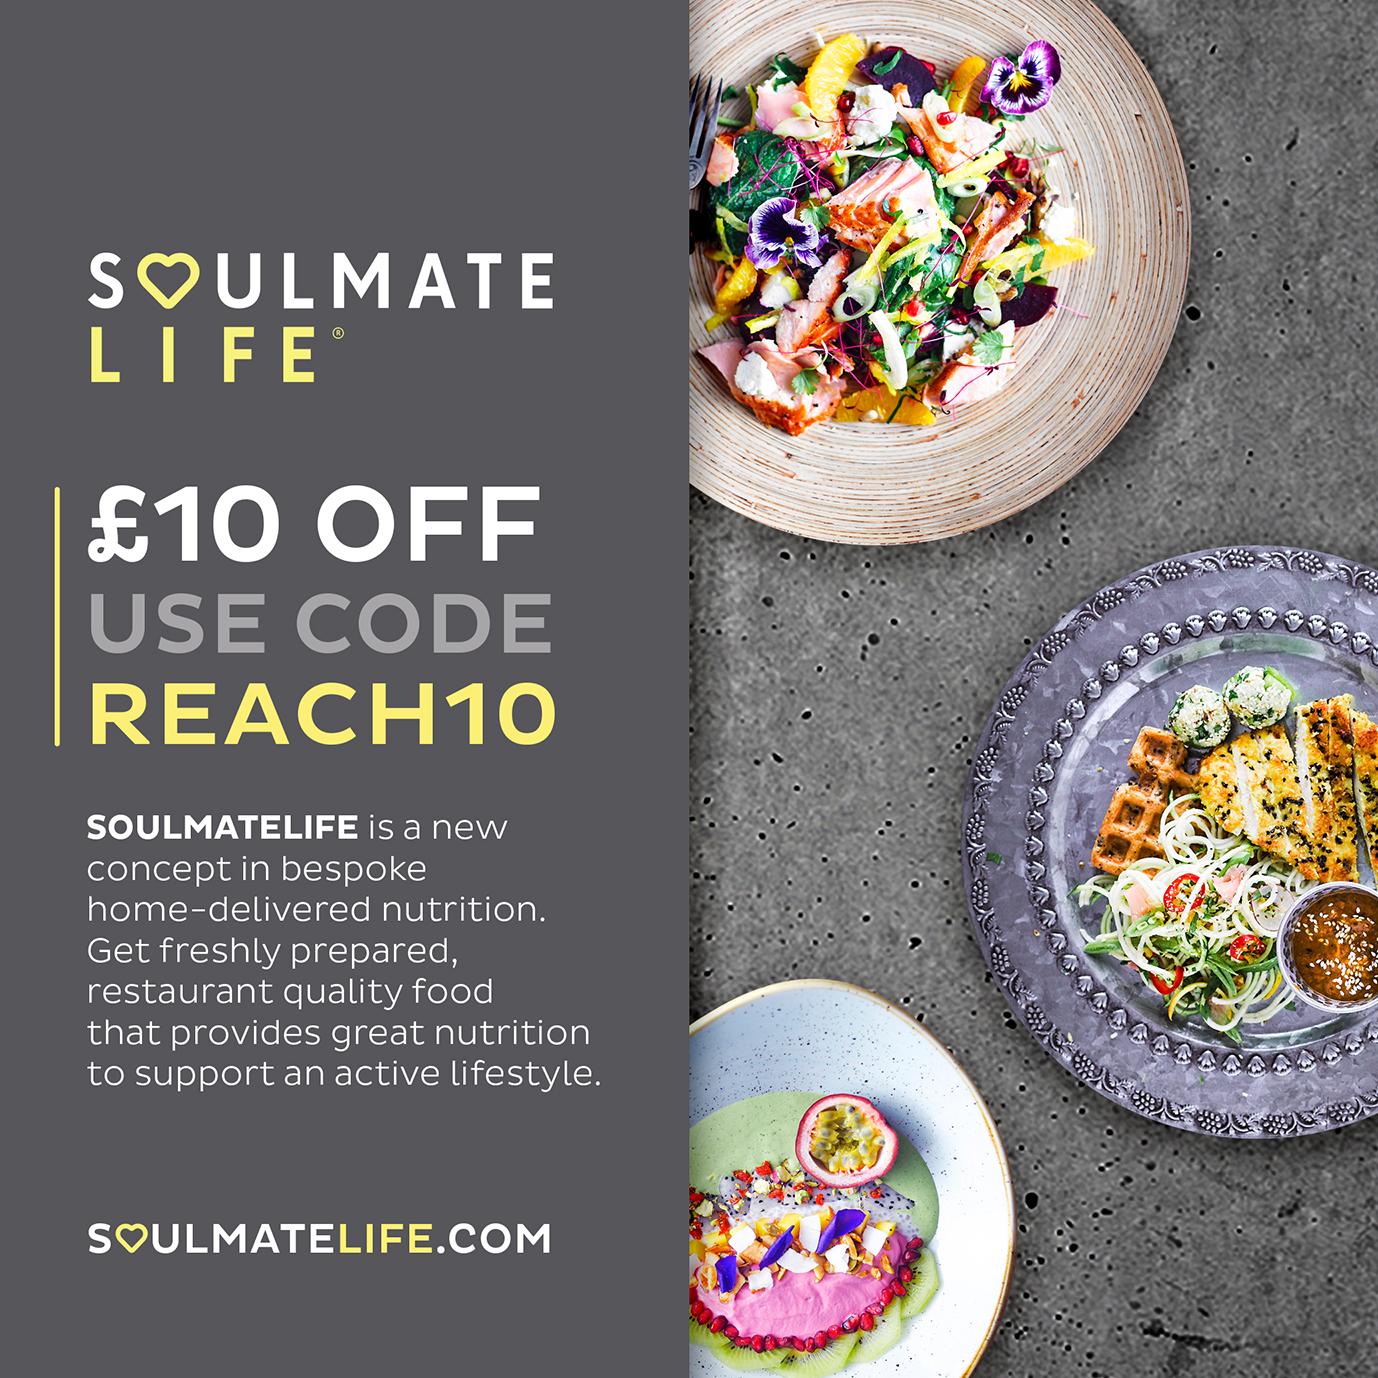 Soulmatefood